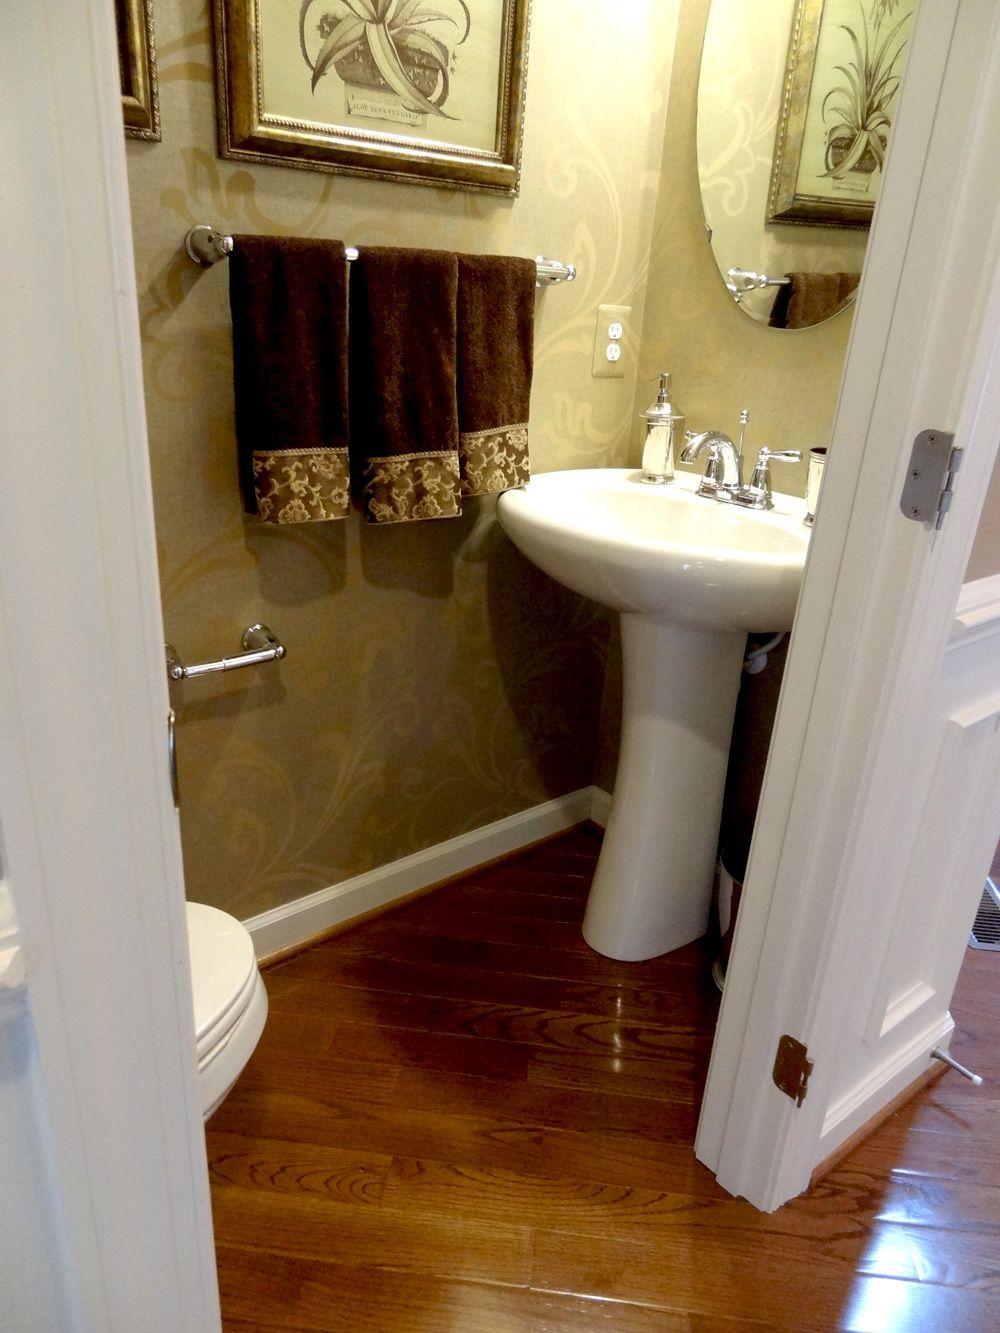 Small narrow half bathroom ideas - 9 Ways To Make A Half Bath Feel Whole